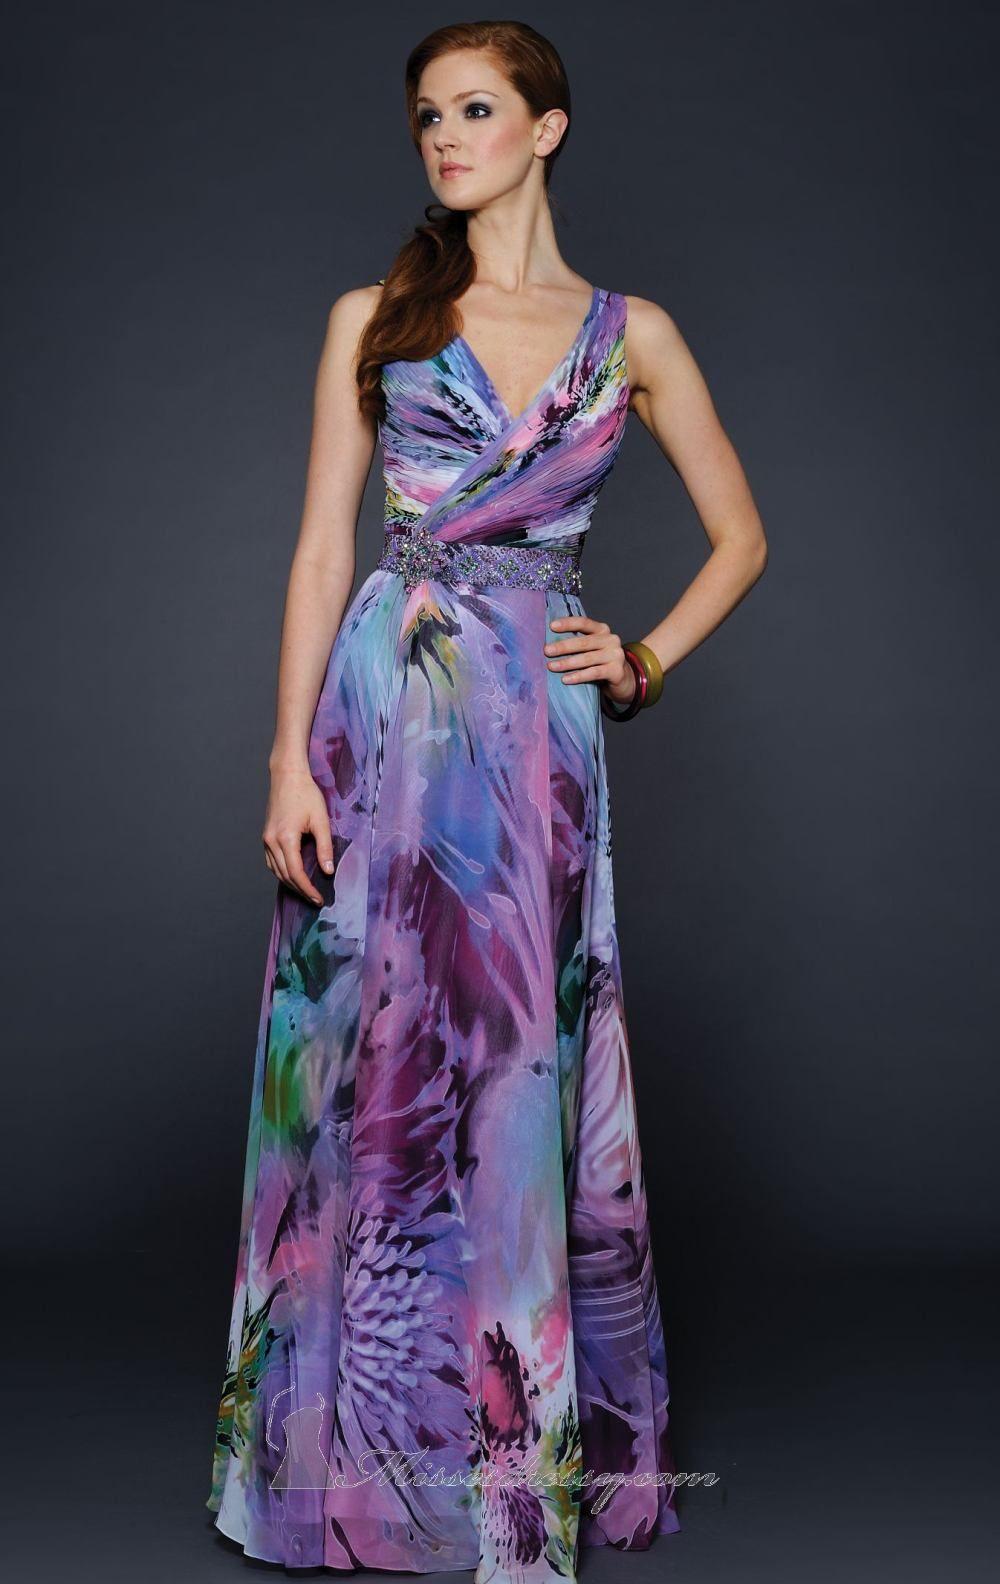 Lara Designs 21632 Dress - MissesDressy.com | Girly | Pinterest